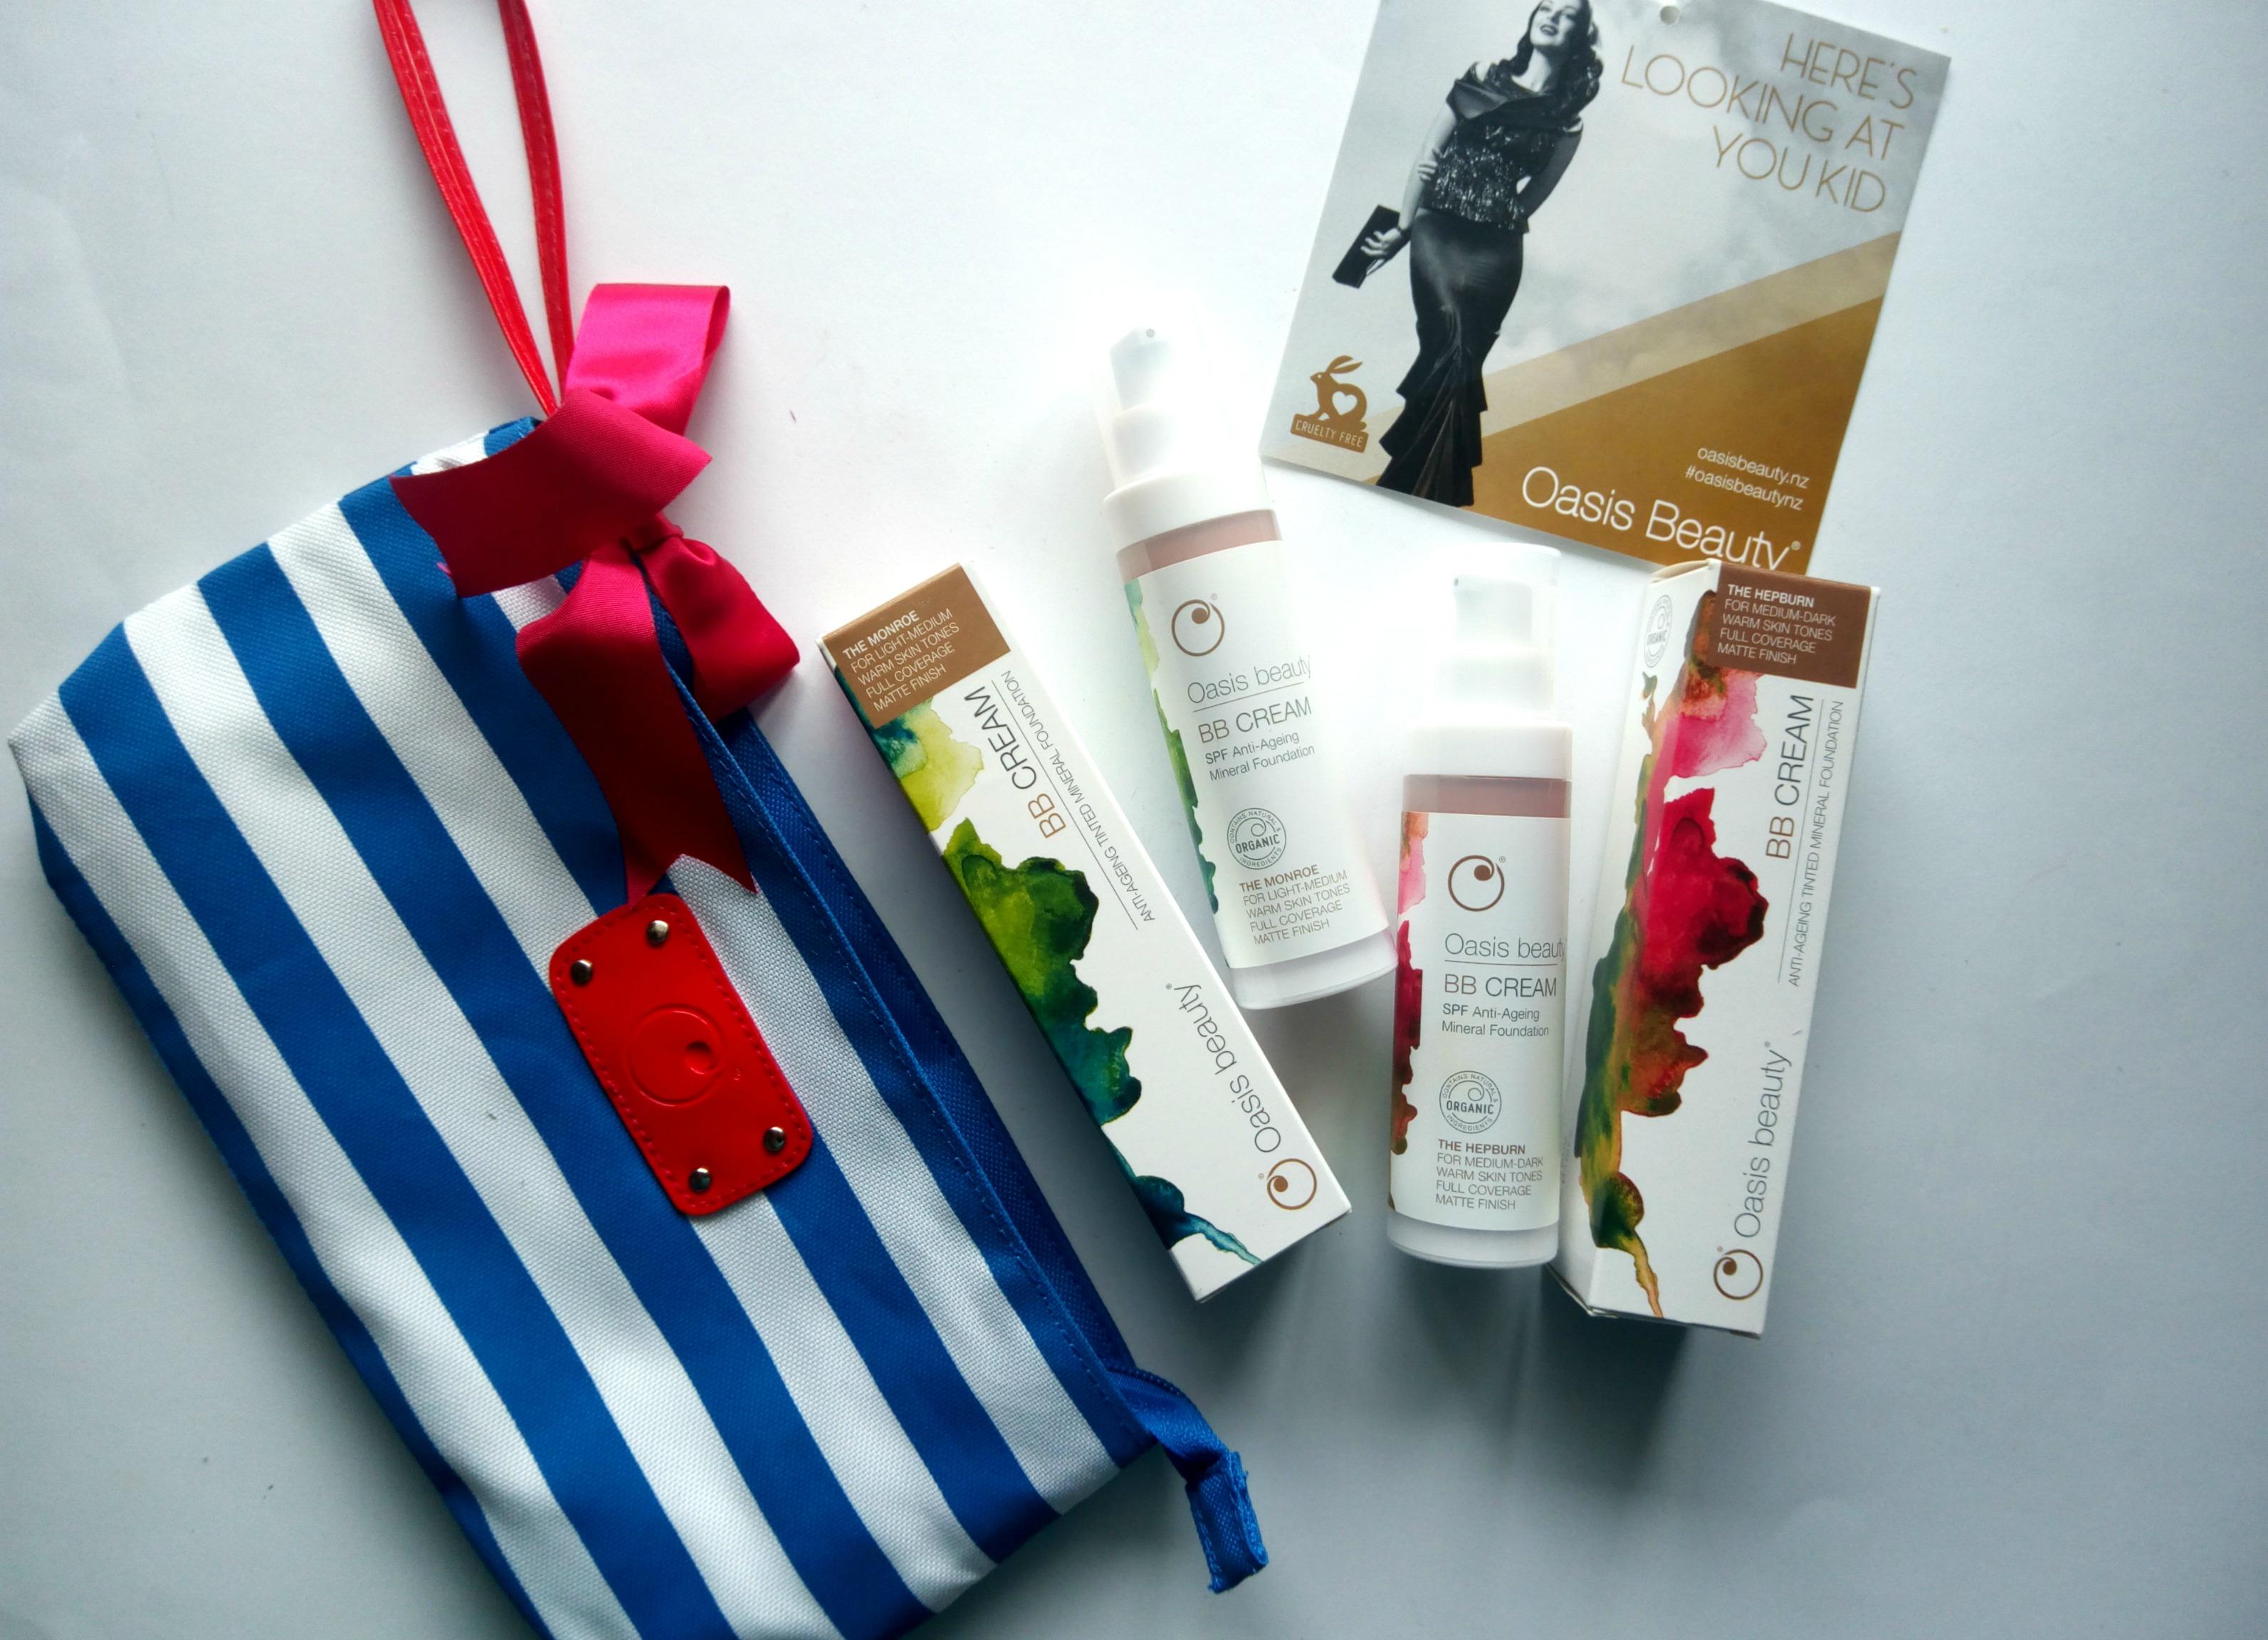 Oasis Beauty BB Creams – Monroe & Hepburn|Review & Swatches